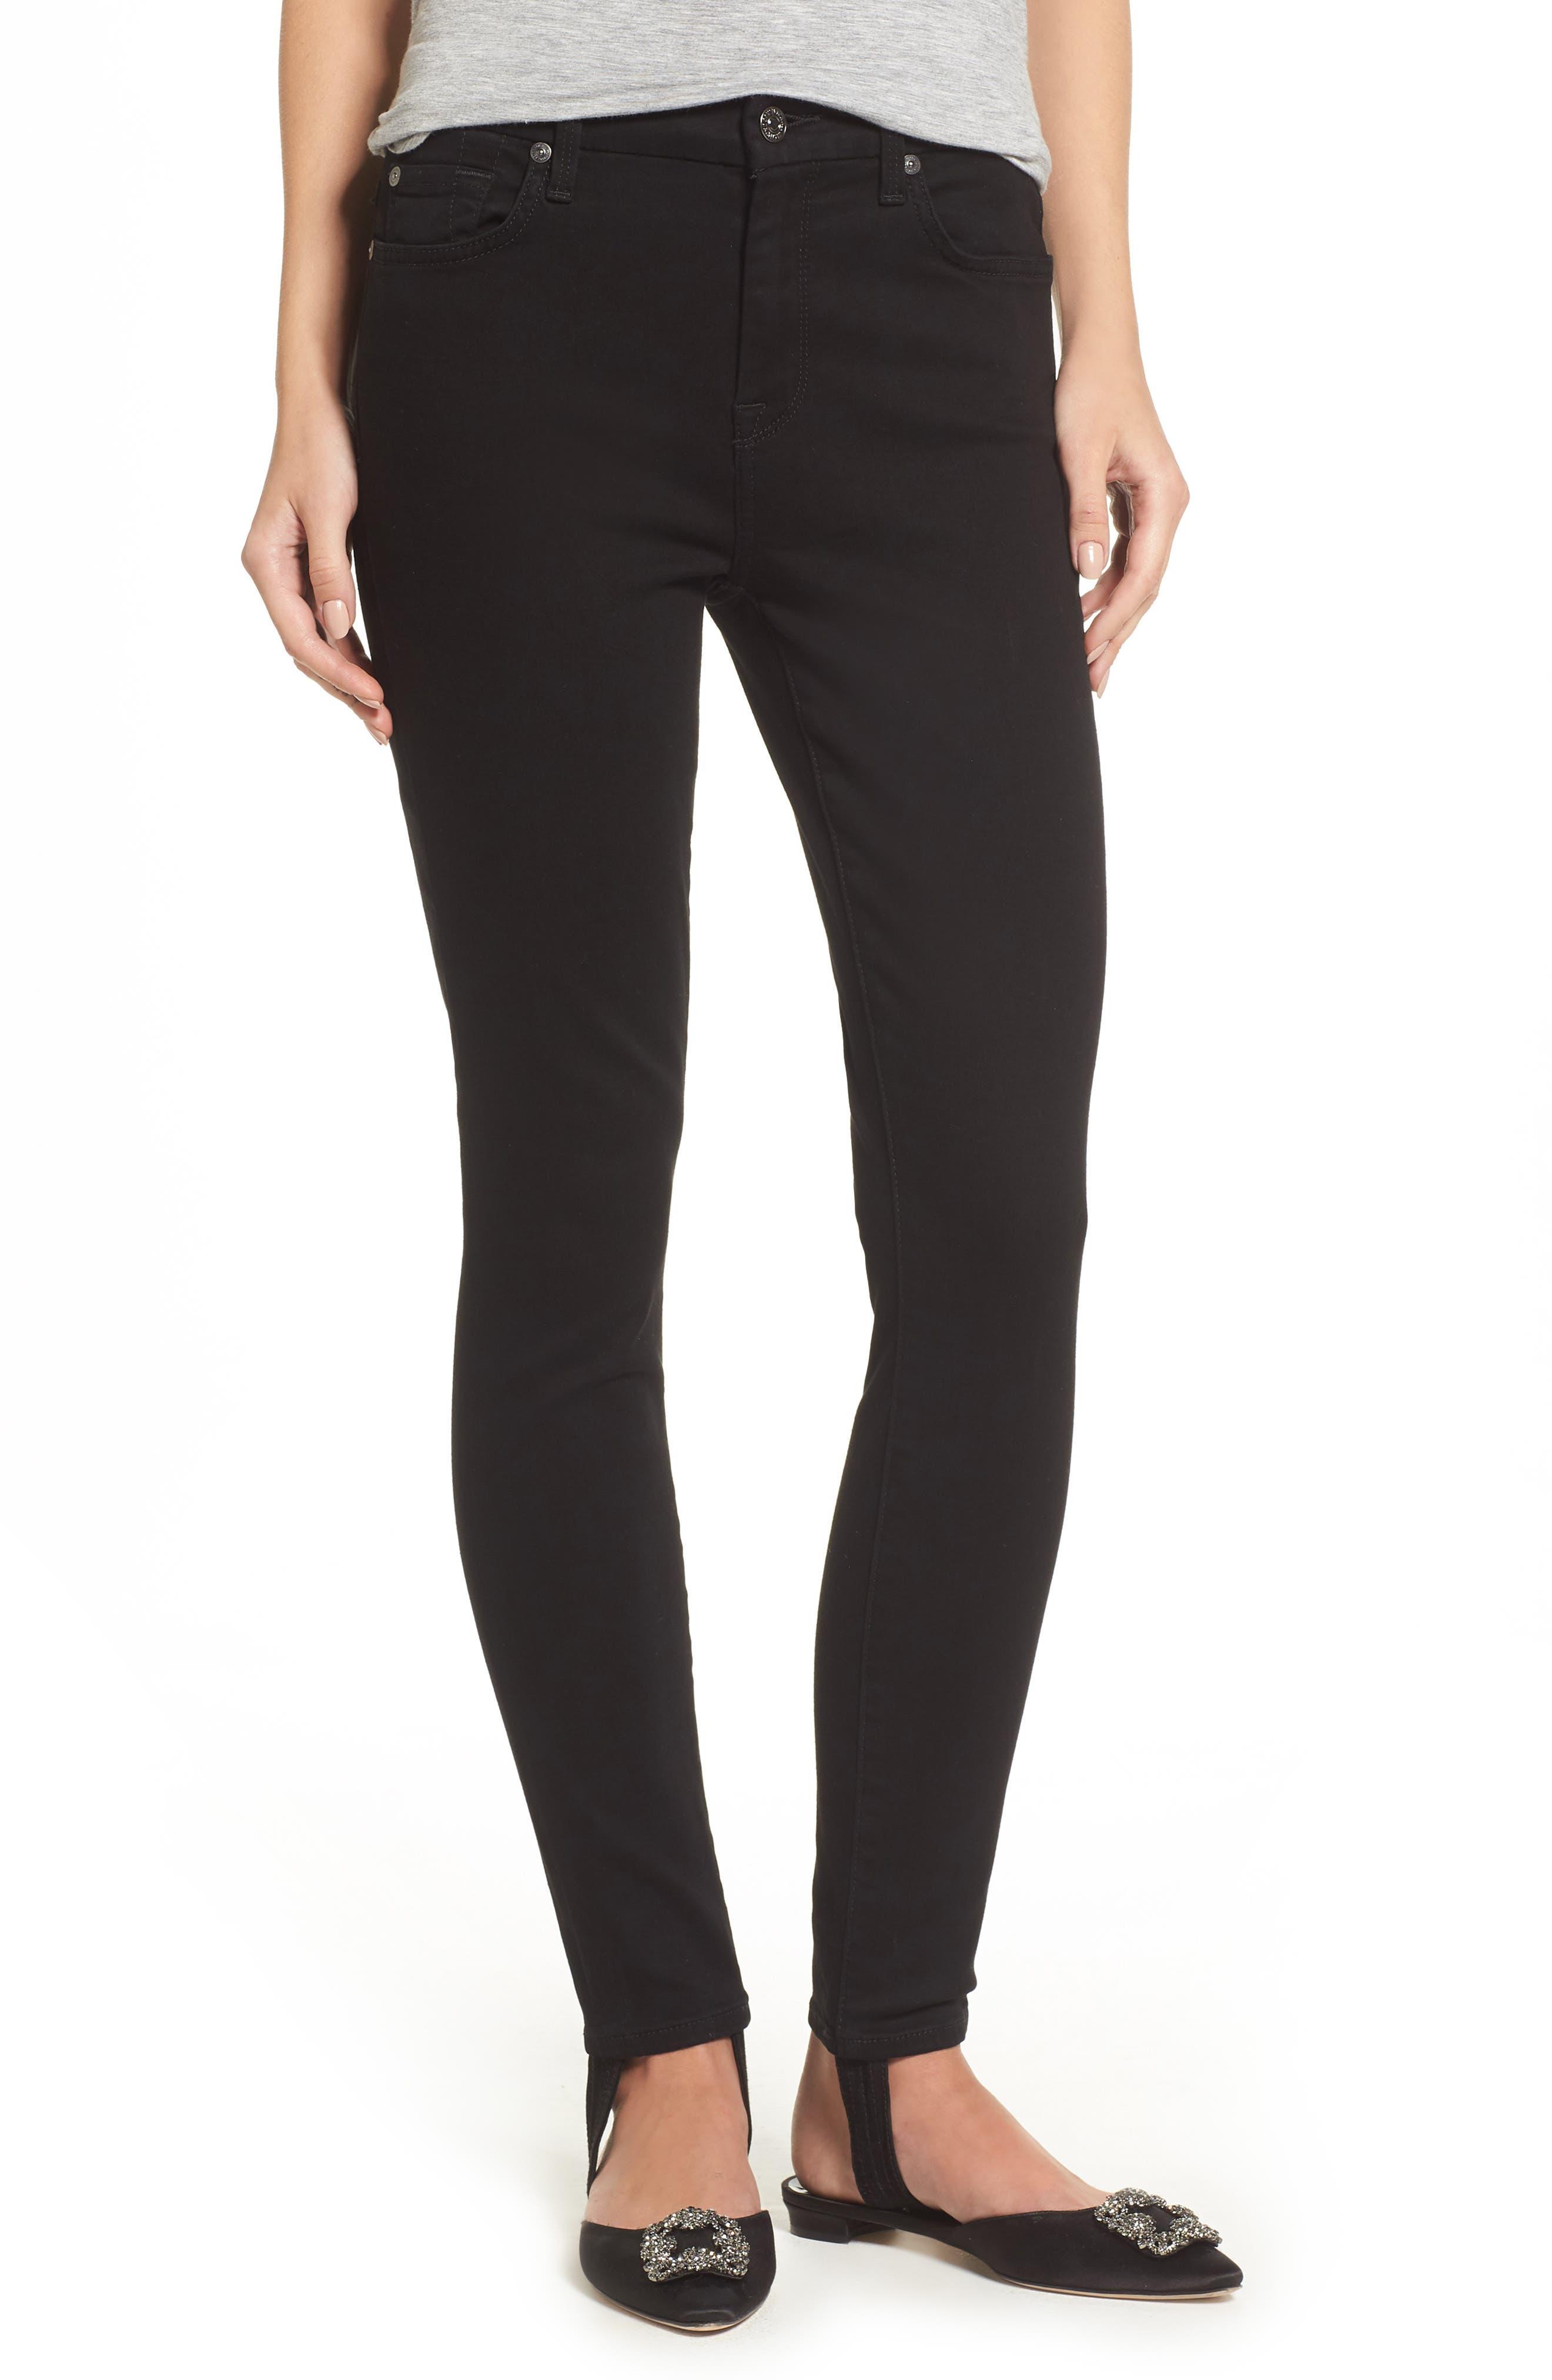 b(air) High Waist Ankle Skinny Stirrup Jeans,                         Main,                         color, B(Air) Black